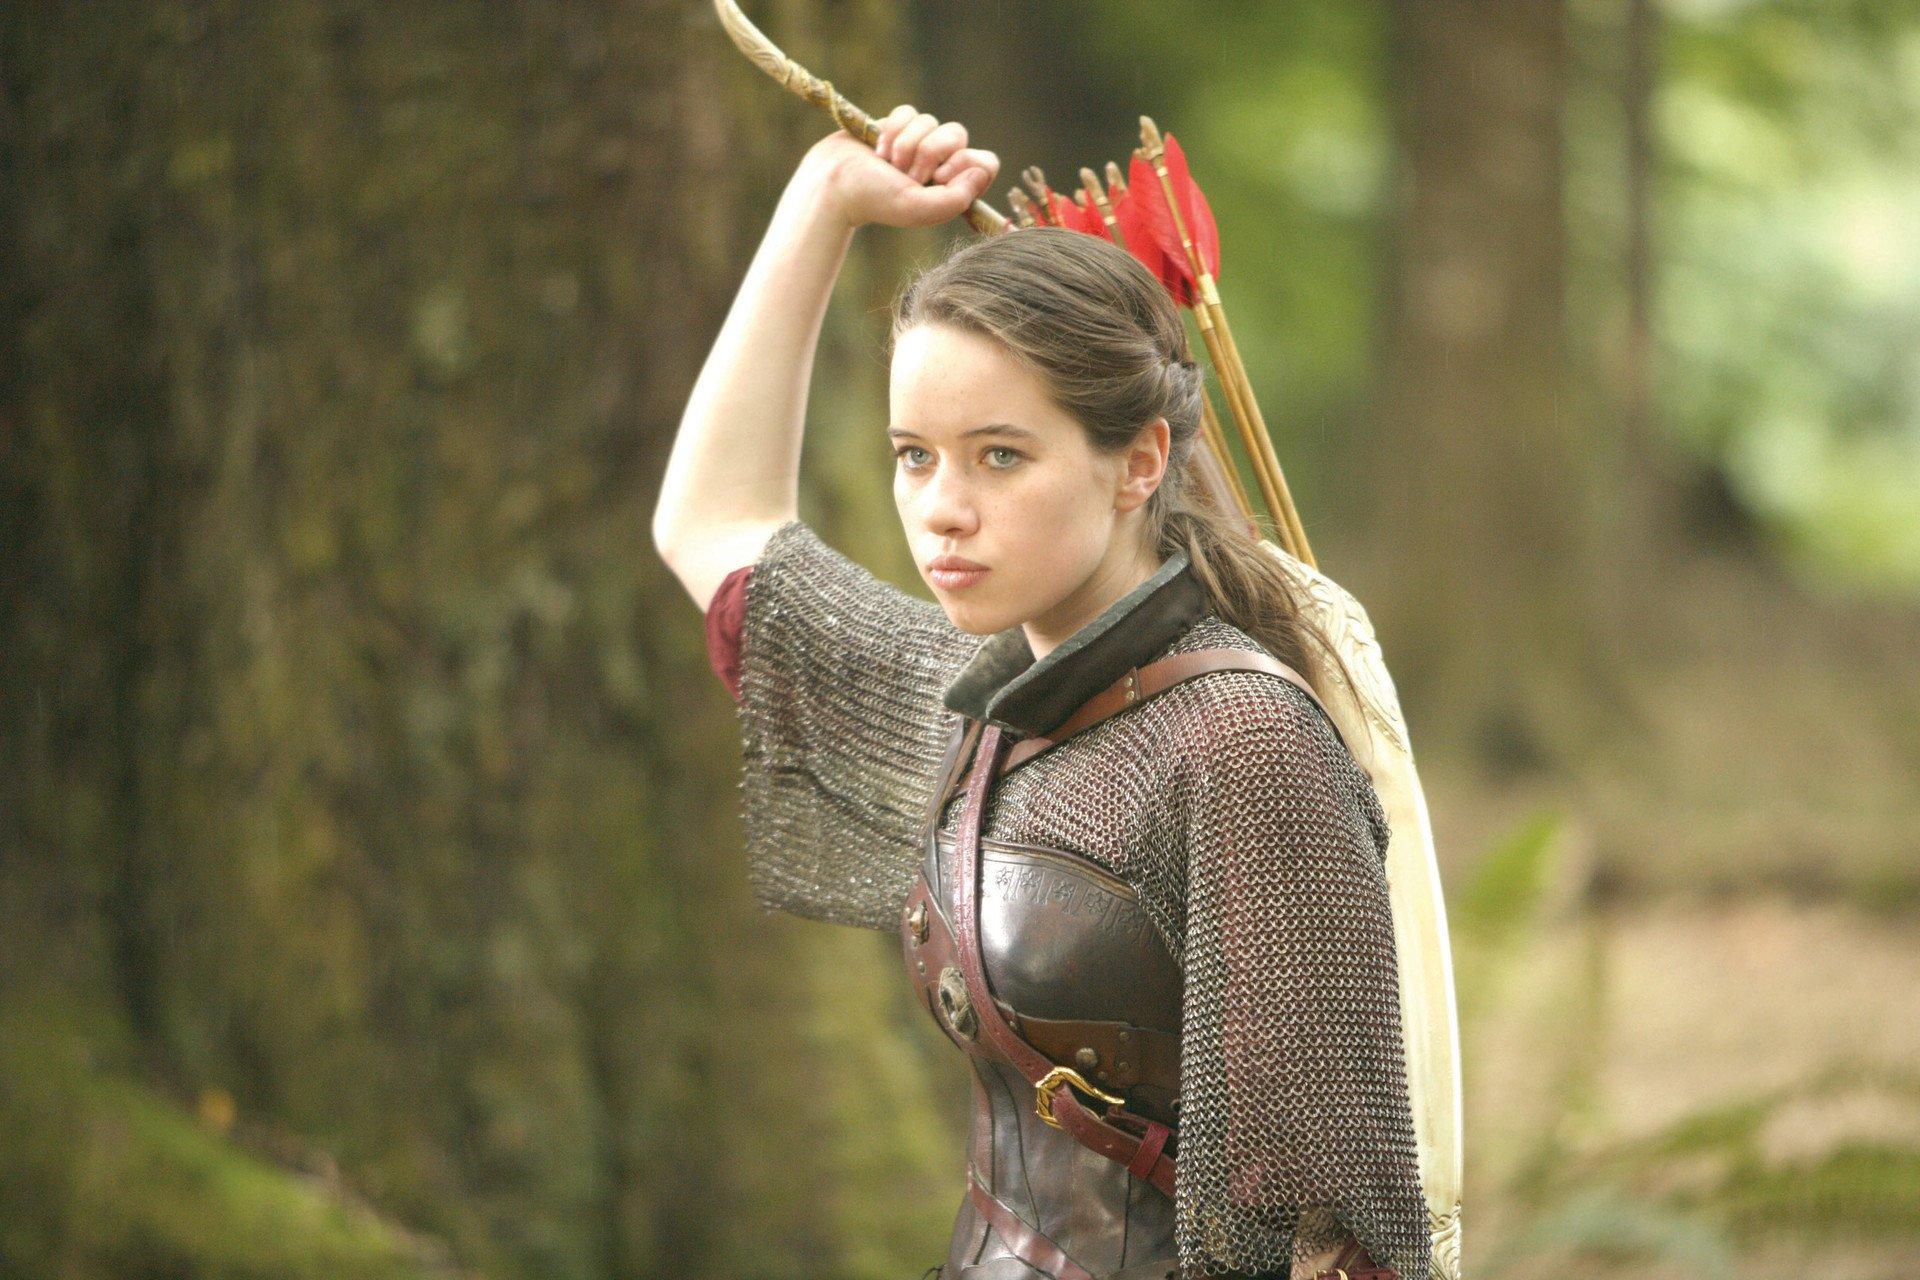 NARNIA adventure fantasy family series book 1narnia chronicl